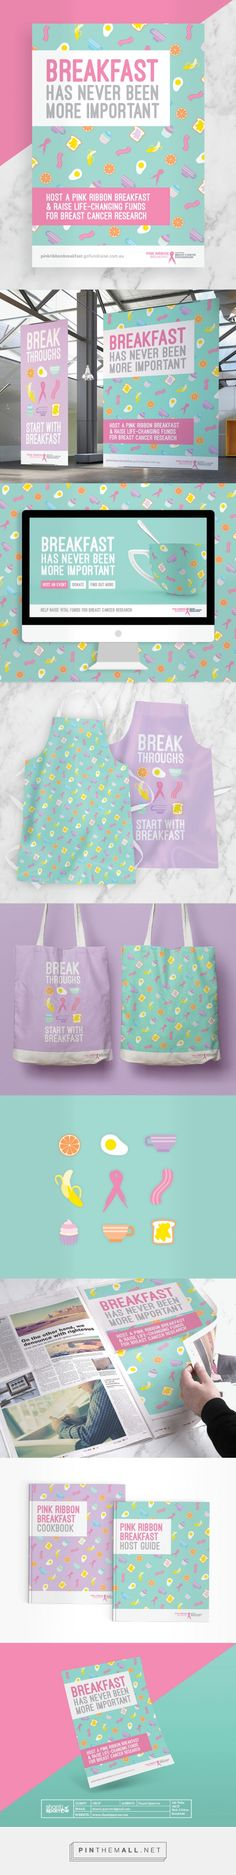 National Breast Cancer Foundation Pink Ribbon Breakfast Branding by Shanti Sparrow Design | Fivestar Branding Agency – Design and Branding Agency & Curated Inspiration Gallery  #design #designideas #designinspiration #branding #identity #posters